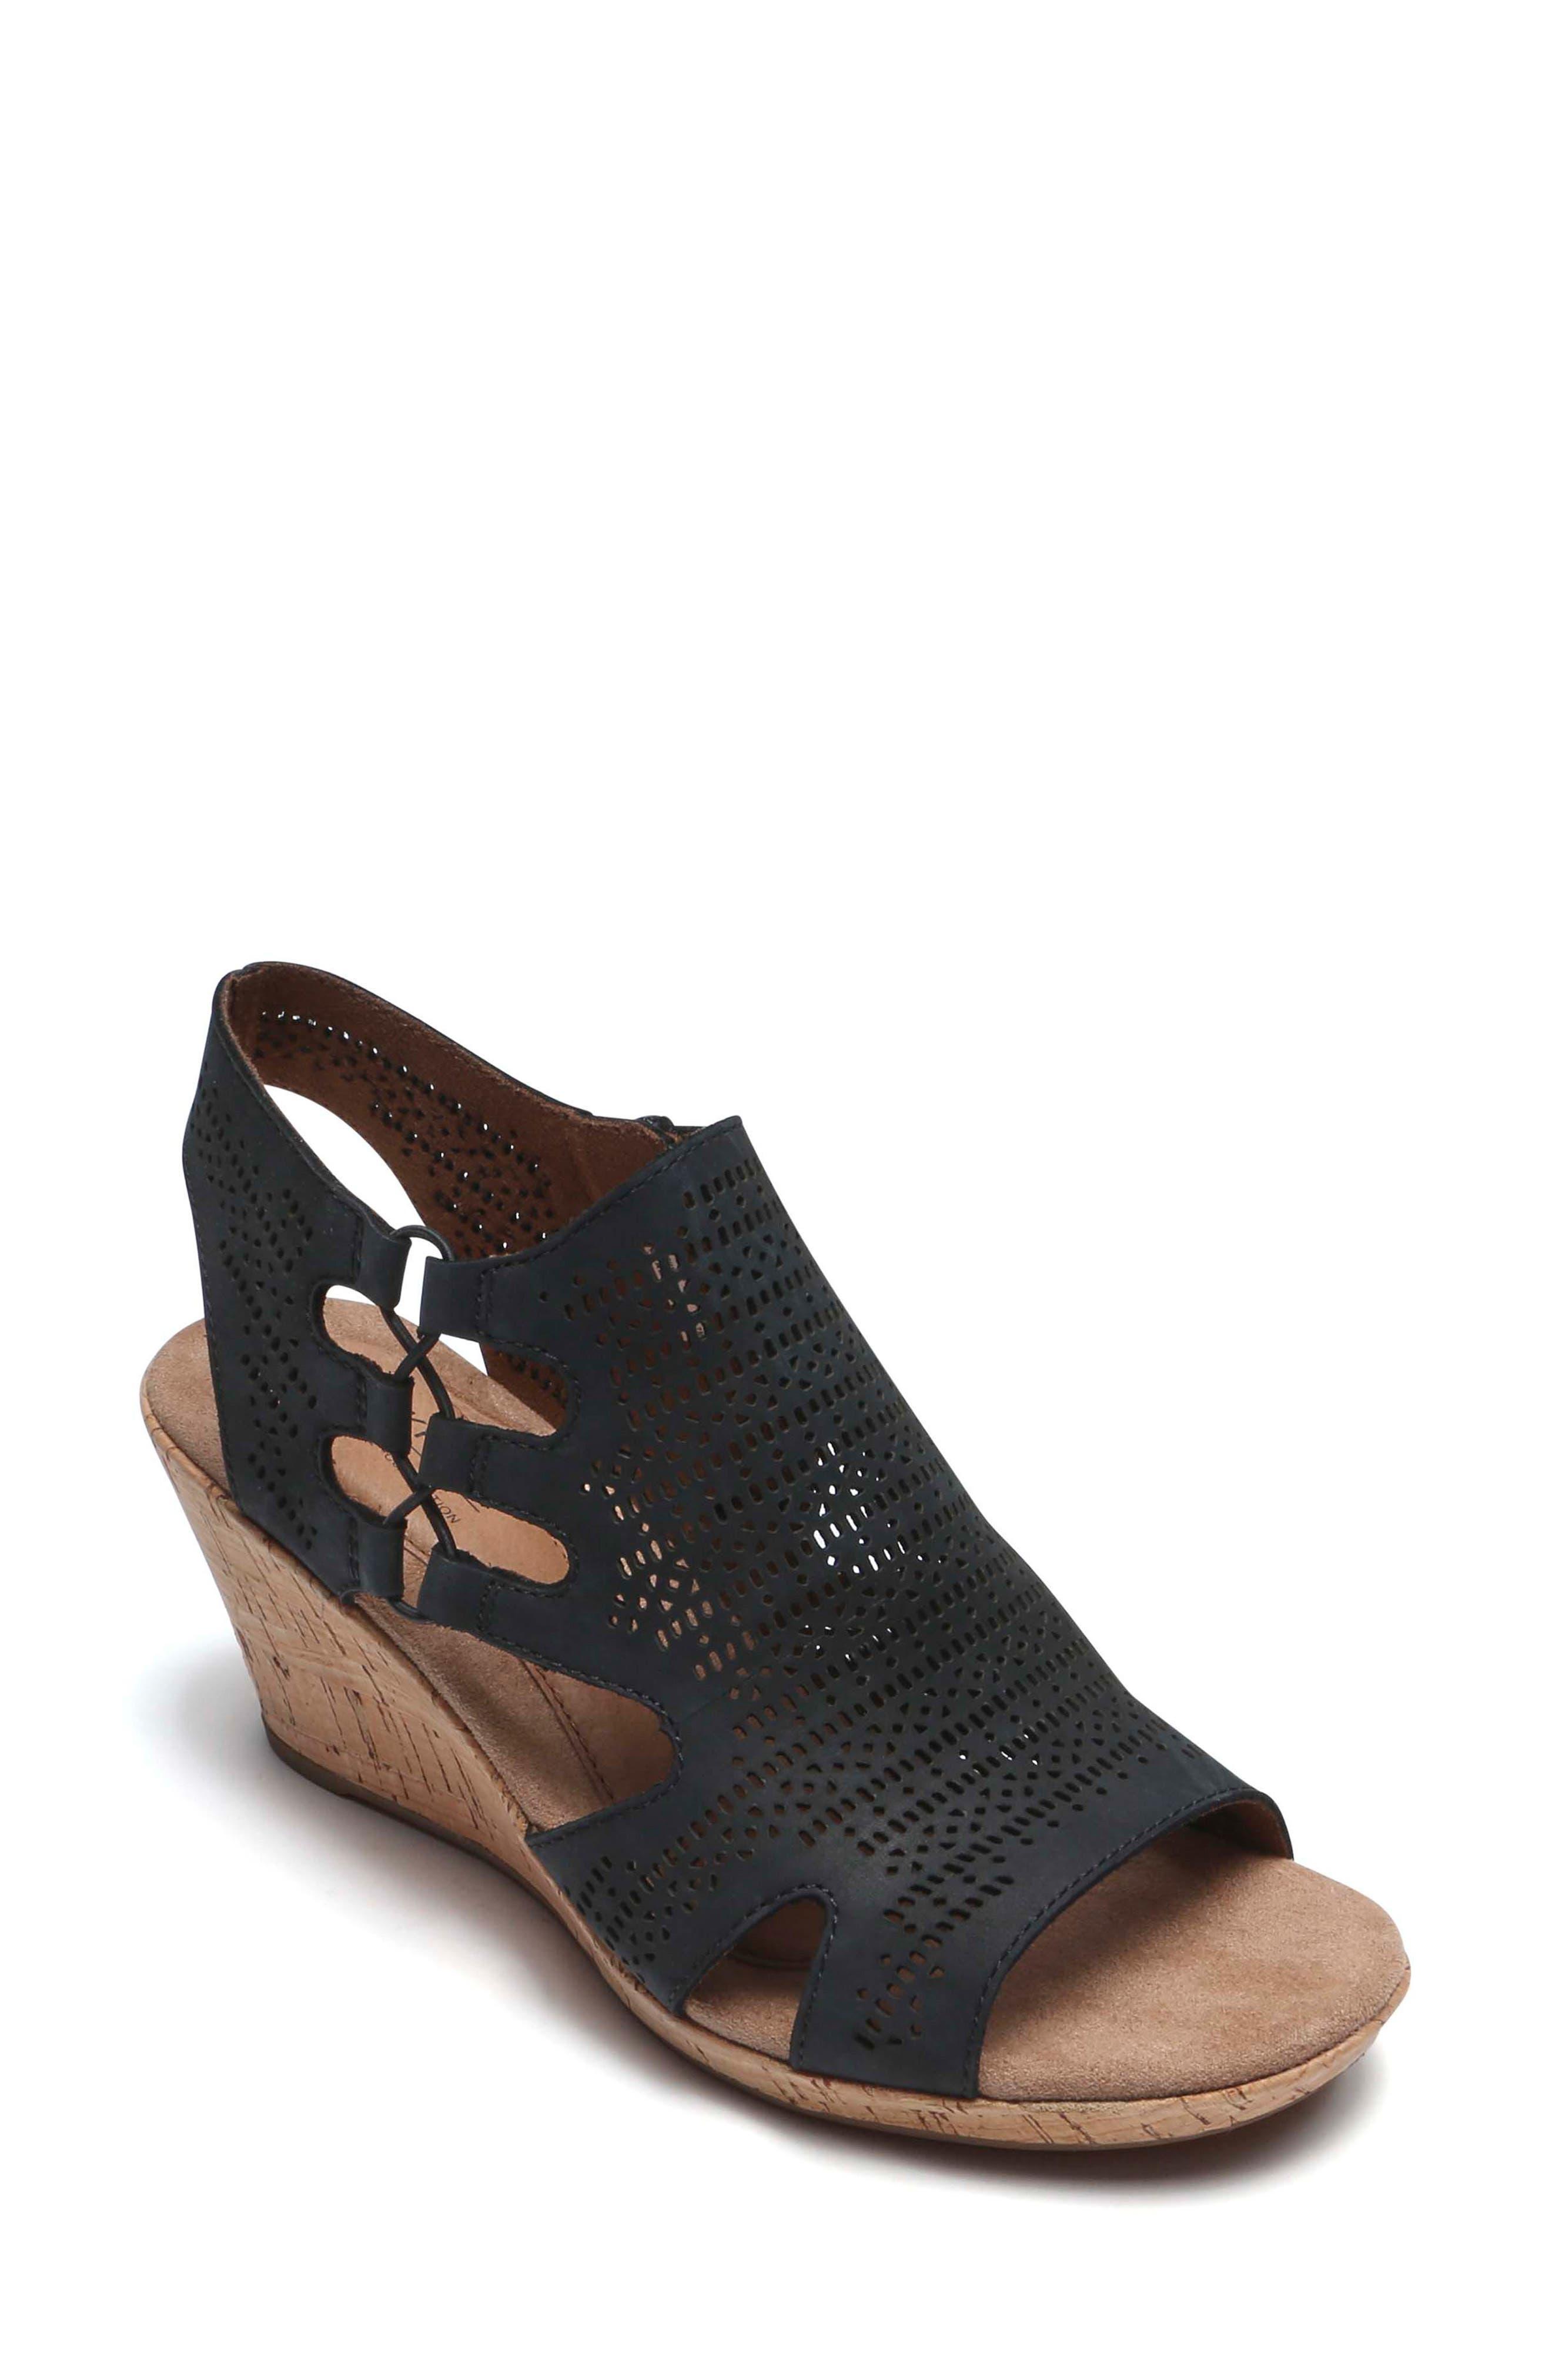 Janna Perforated Wedge Sandal,                             Main thumbnail 1, color,                             BLACK NUBUCK LEATHER